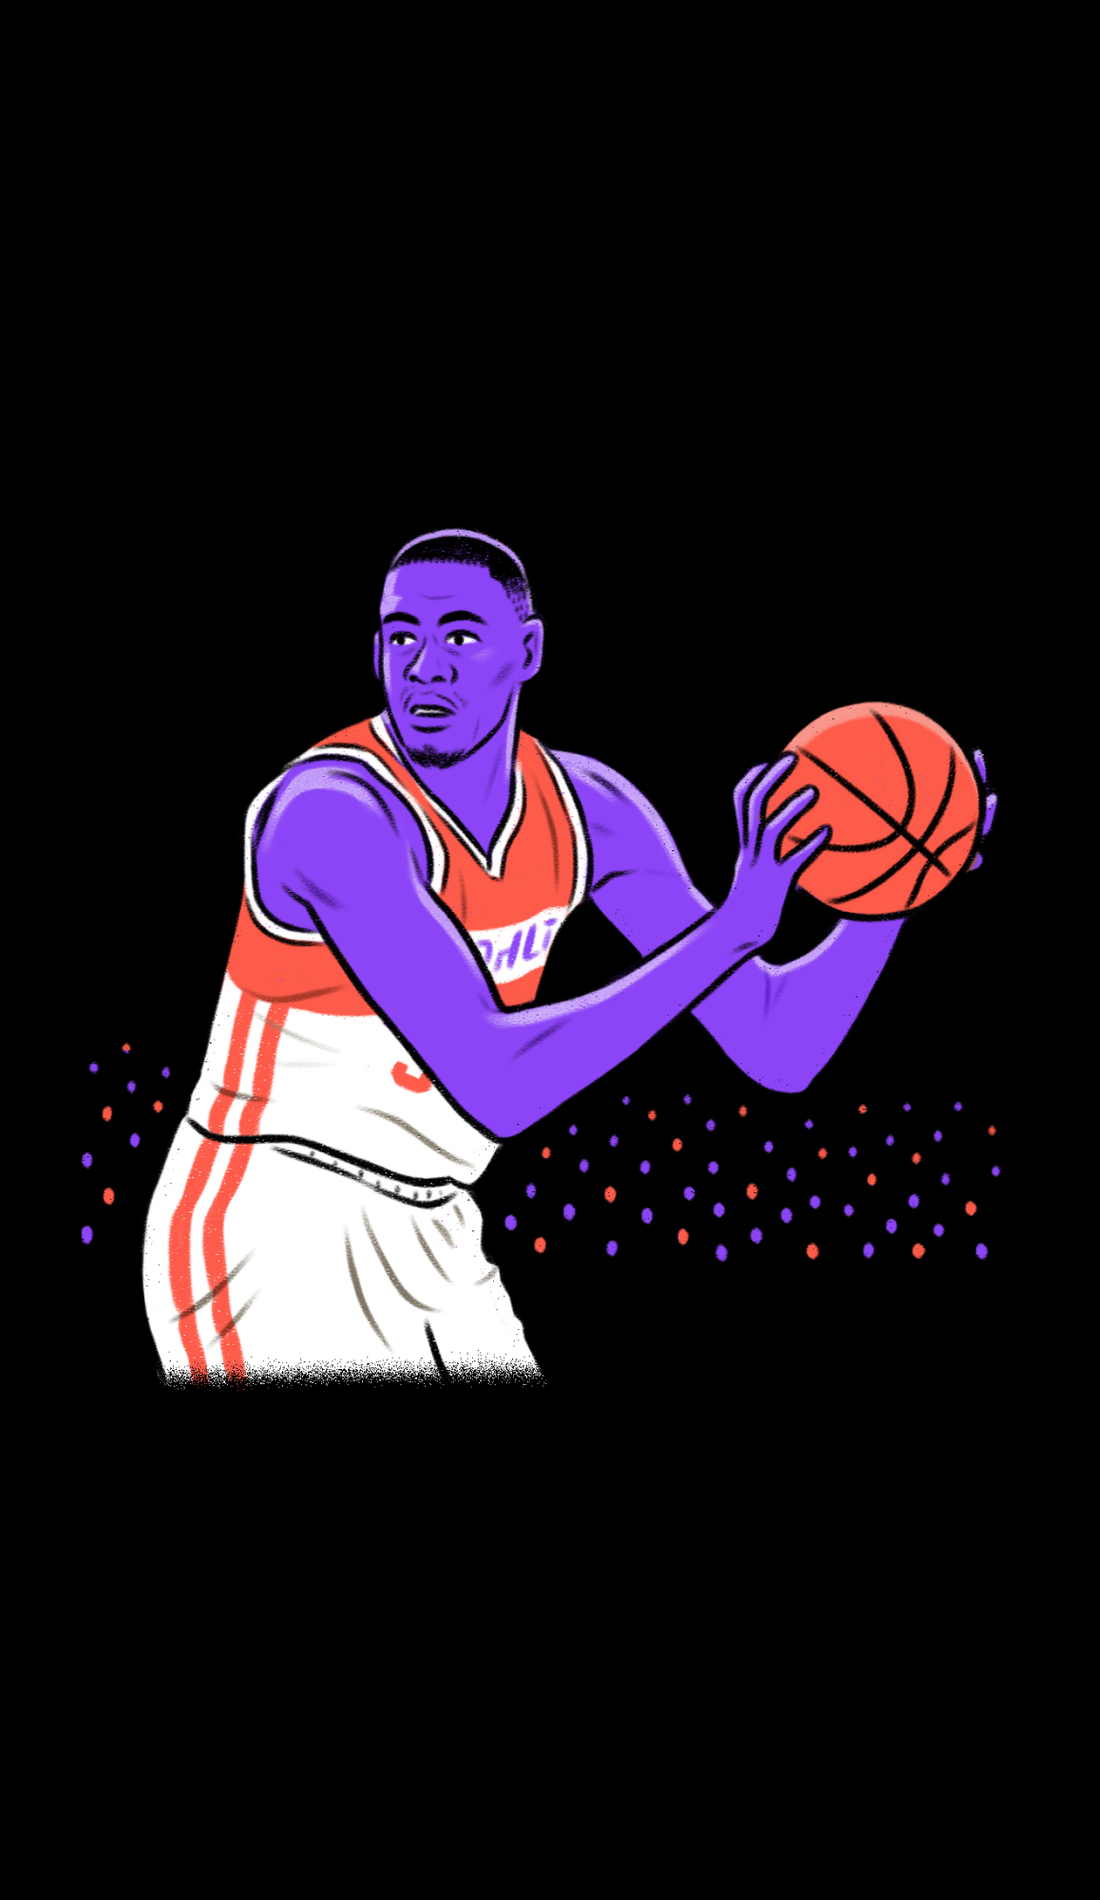 A USC Trojans Basketball live event